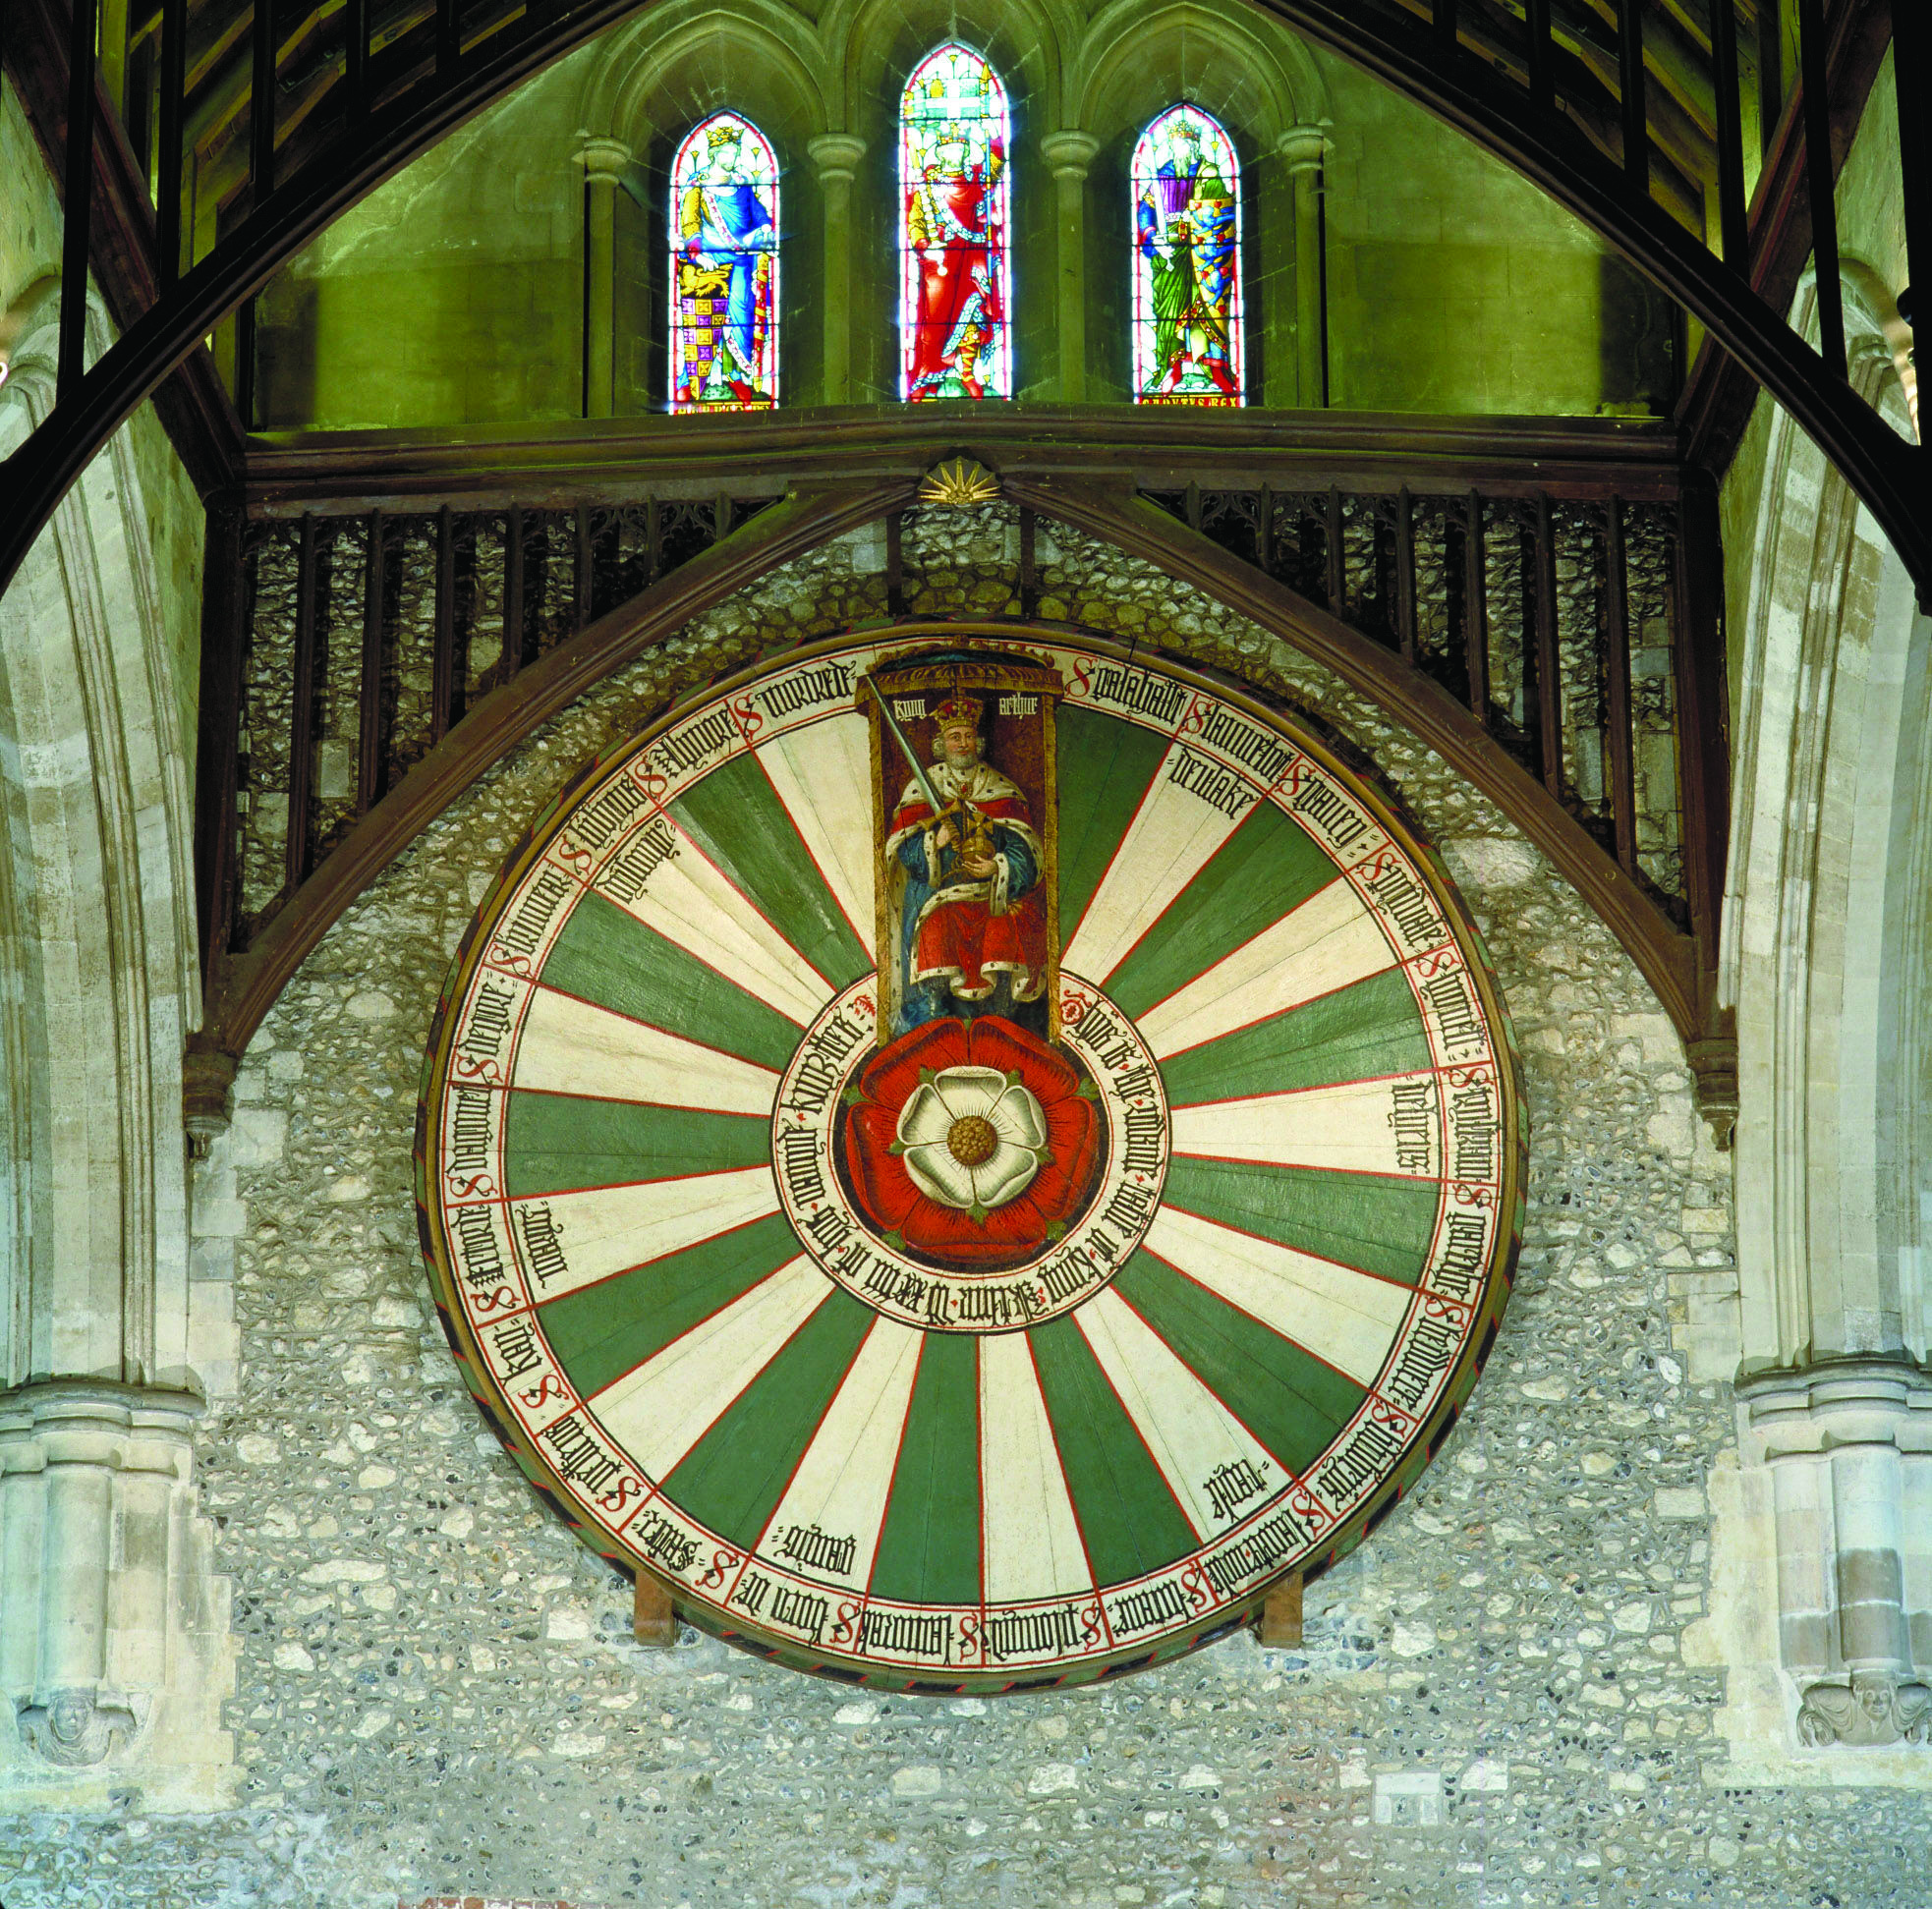 King Arthur's Round Table, Winchester   Roi arthur table ronde, Winchester,  Ville médiévale